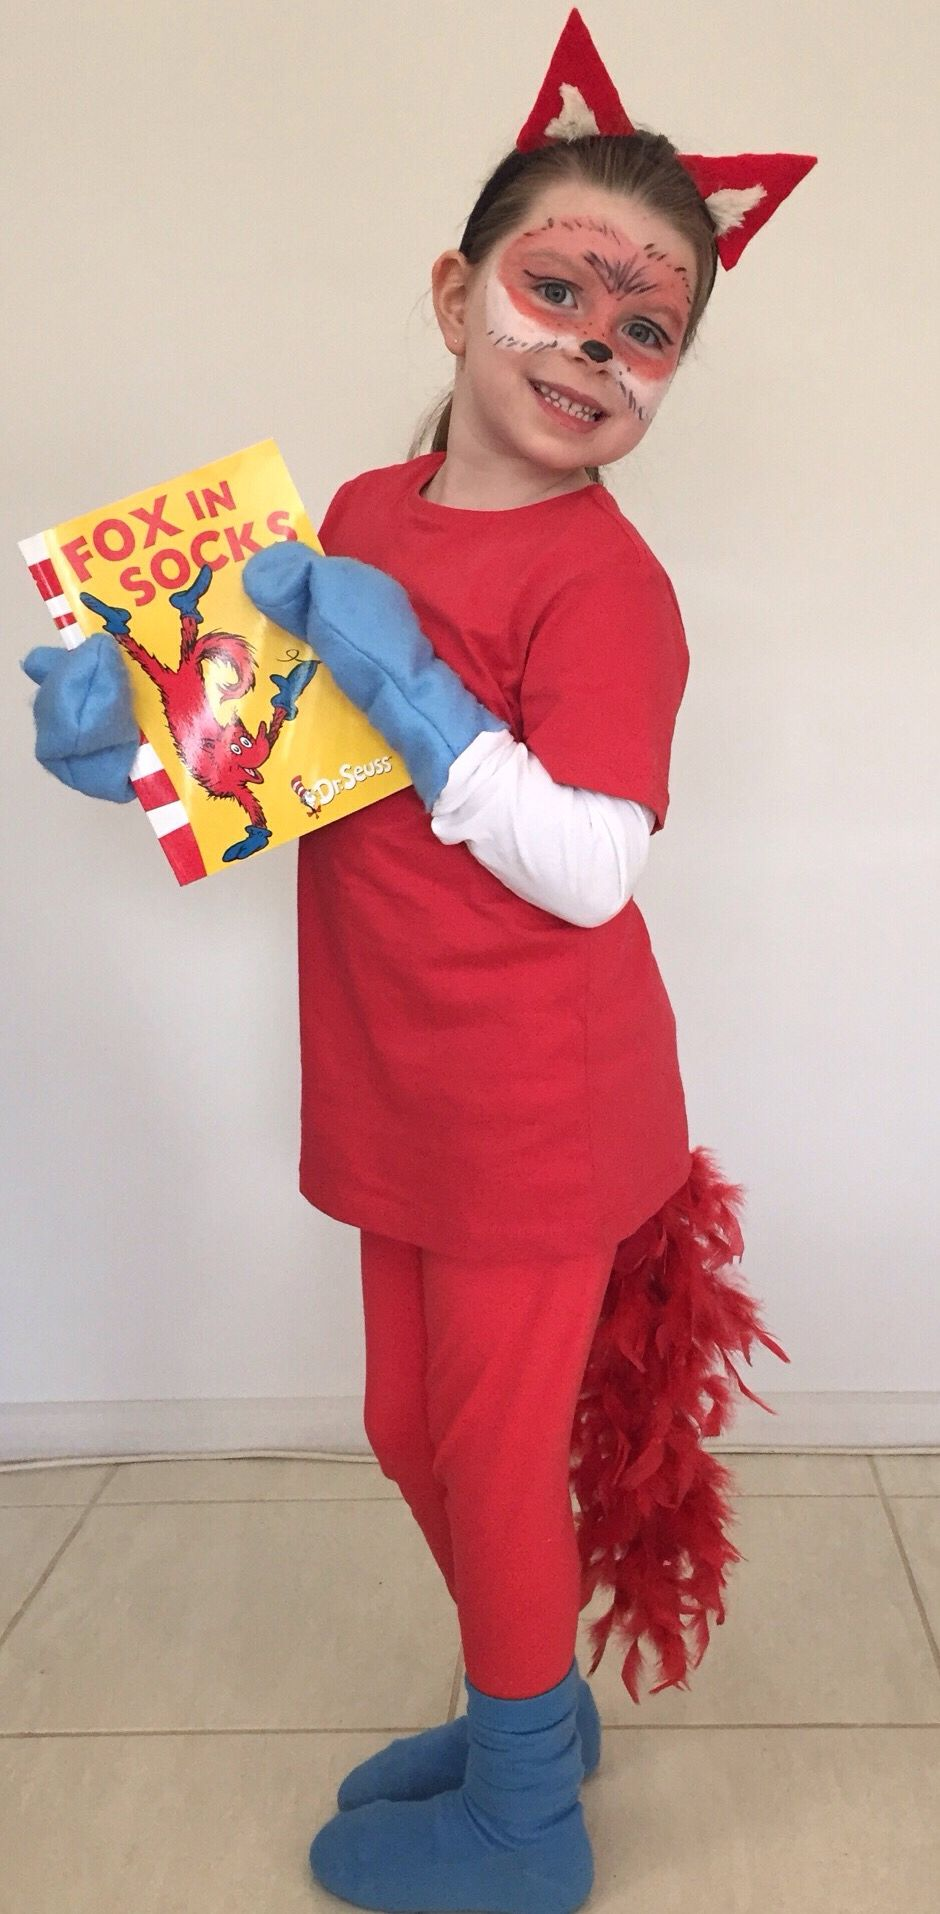 Dr. Seuss Fox in Socks Costume | dr seuss | Pinterest | Foxes ...